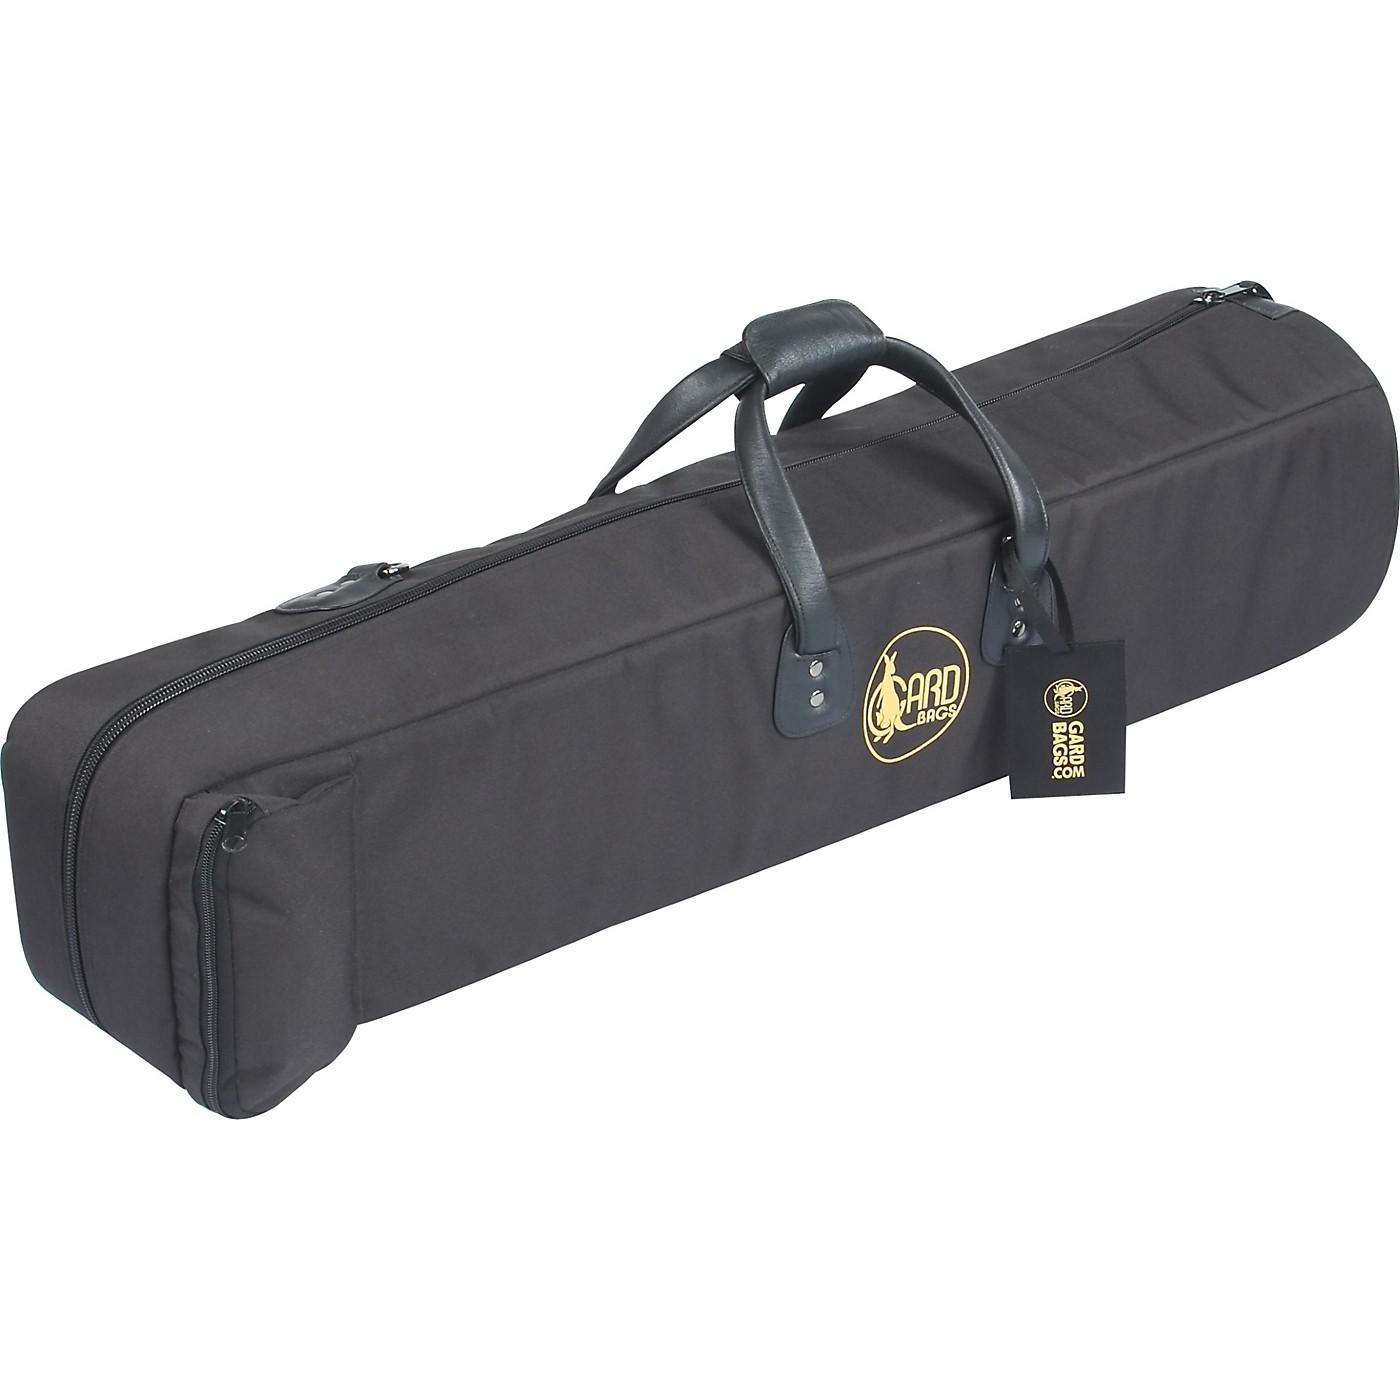 Gard Mid-Suspension G Series Trombone Gig Bag thumbnail